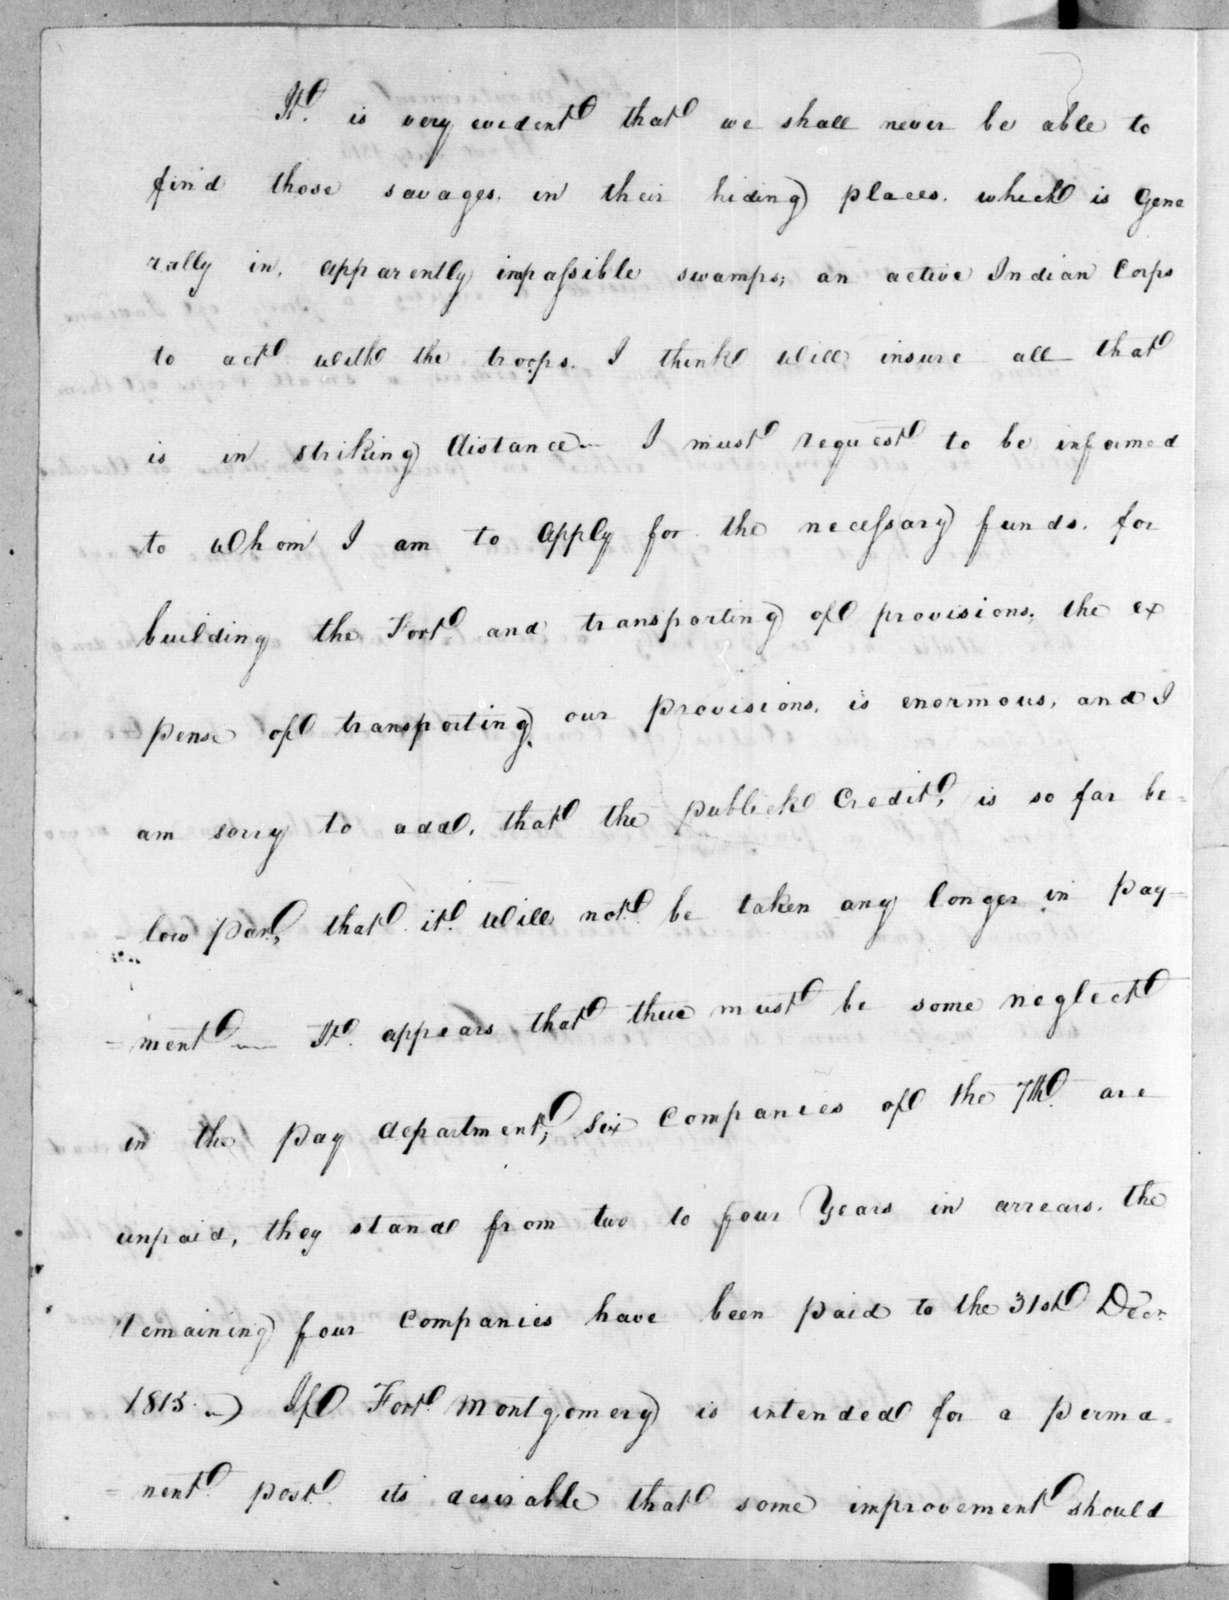 James McDonald to Andrew Jackson, July 22, 1816